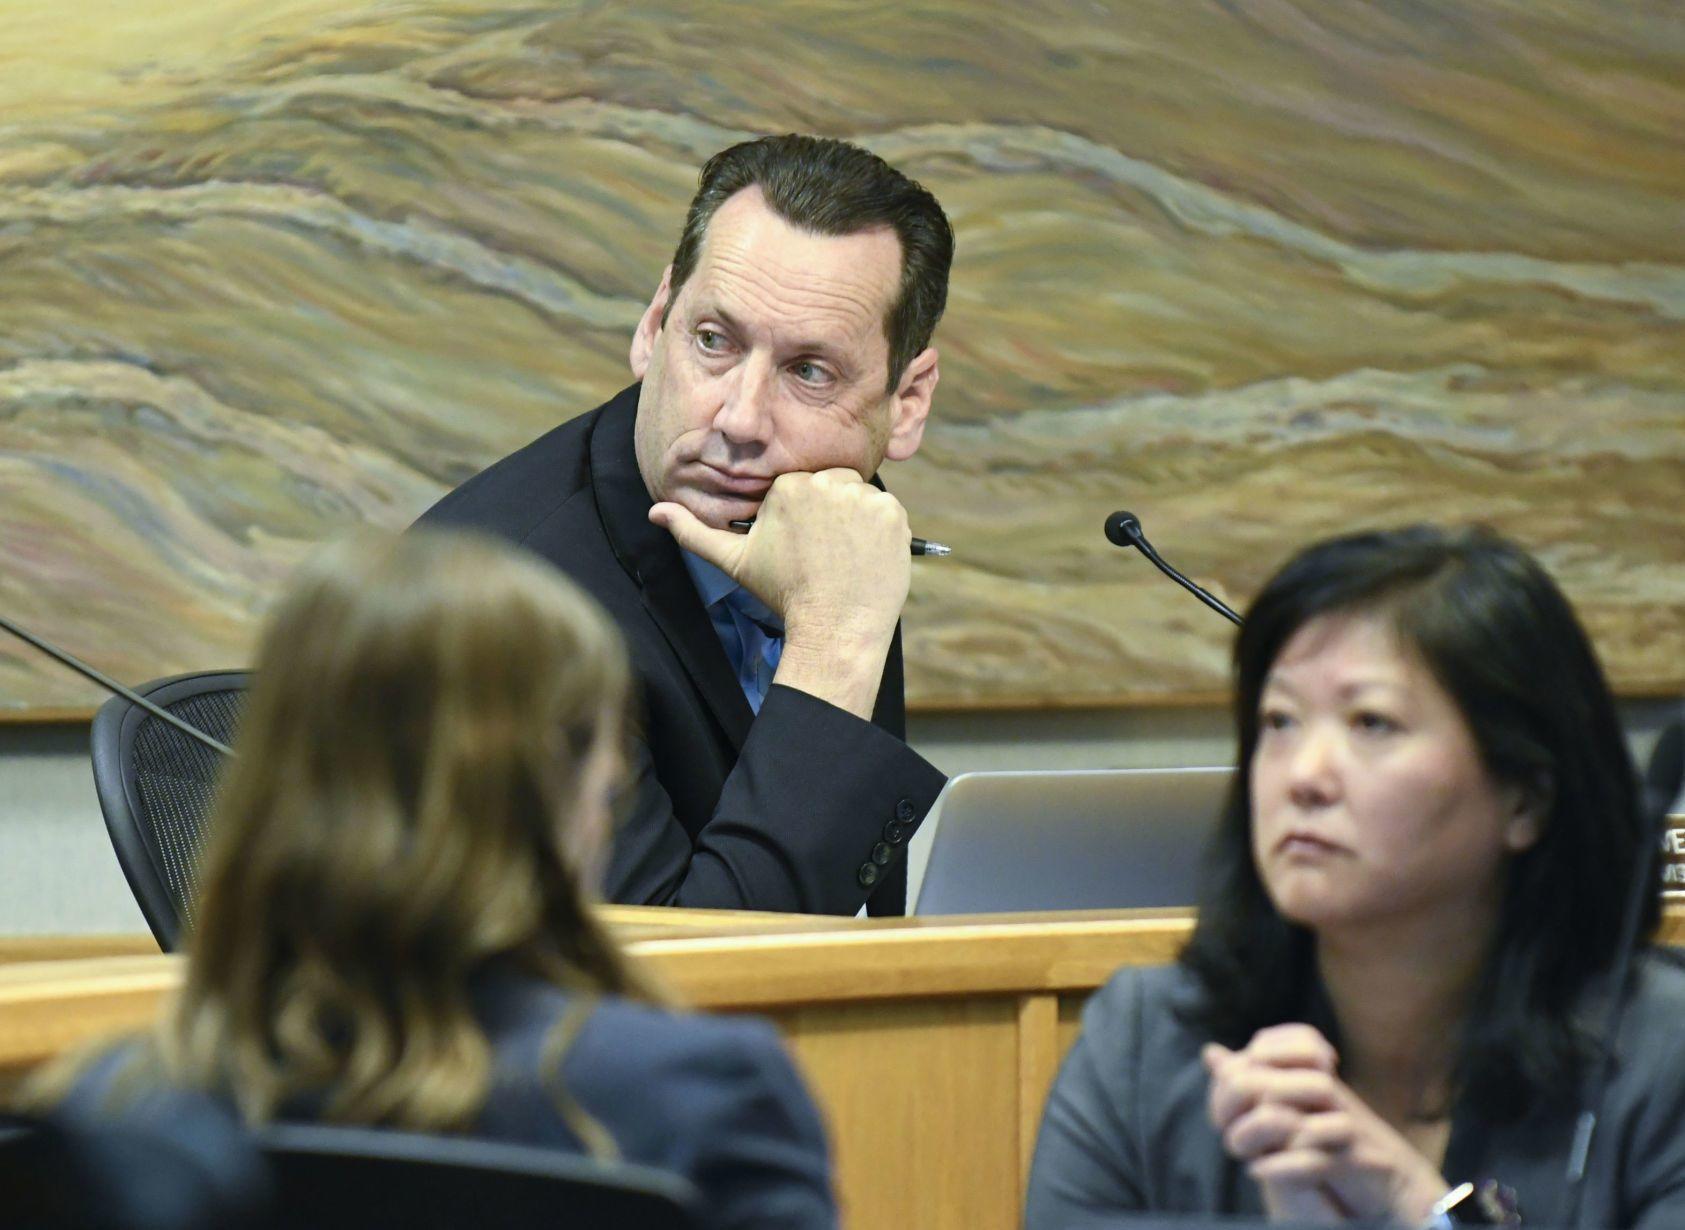 lompocrecord.com - Mike Hodgson mhodgson@santamariatimes.com  - Scathing grand jury report critical of Santa Barbara County's cannabis regulation